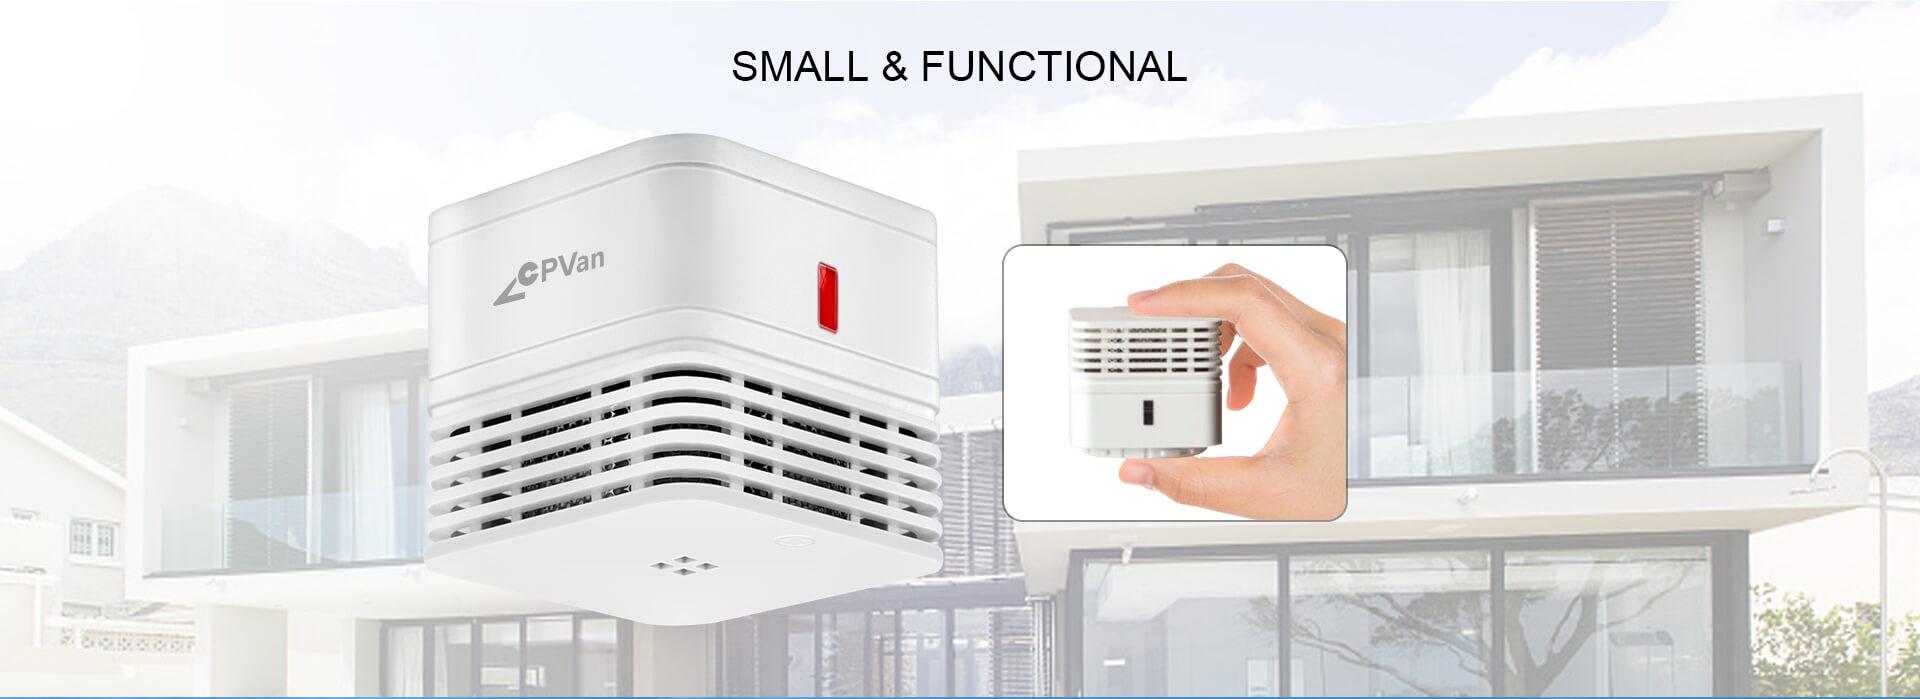 Large Smoke Detector (L series)